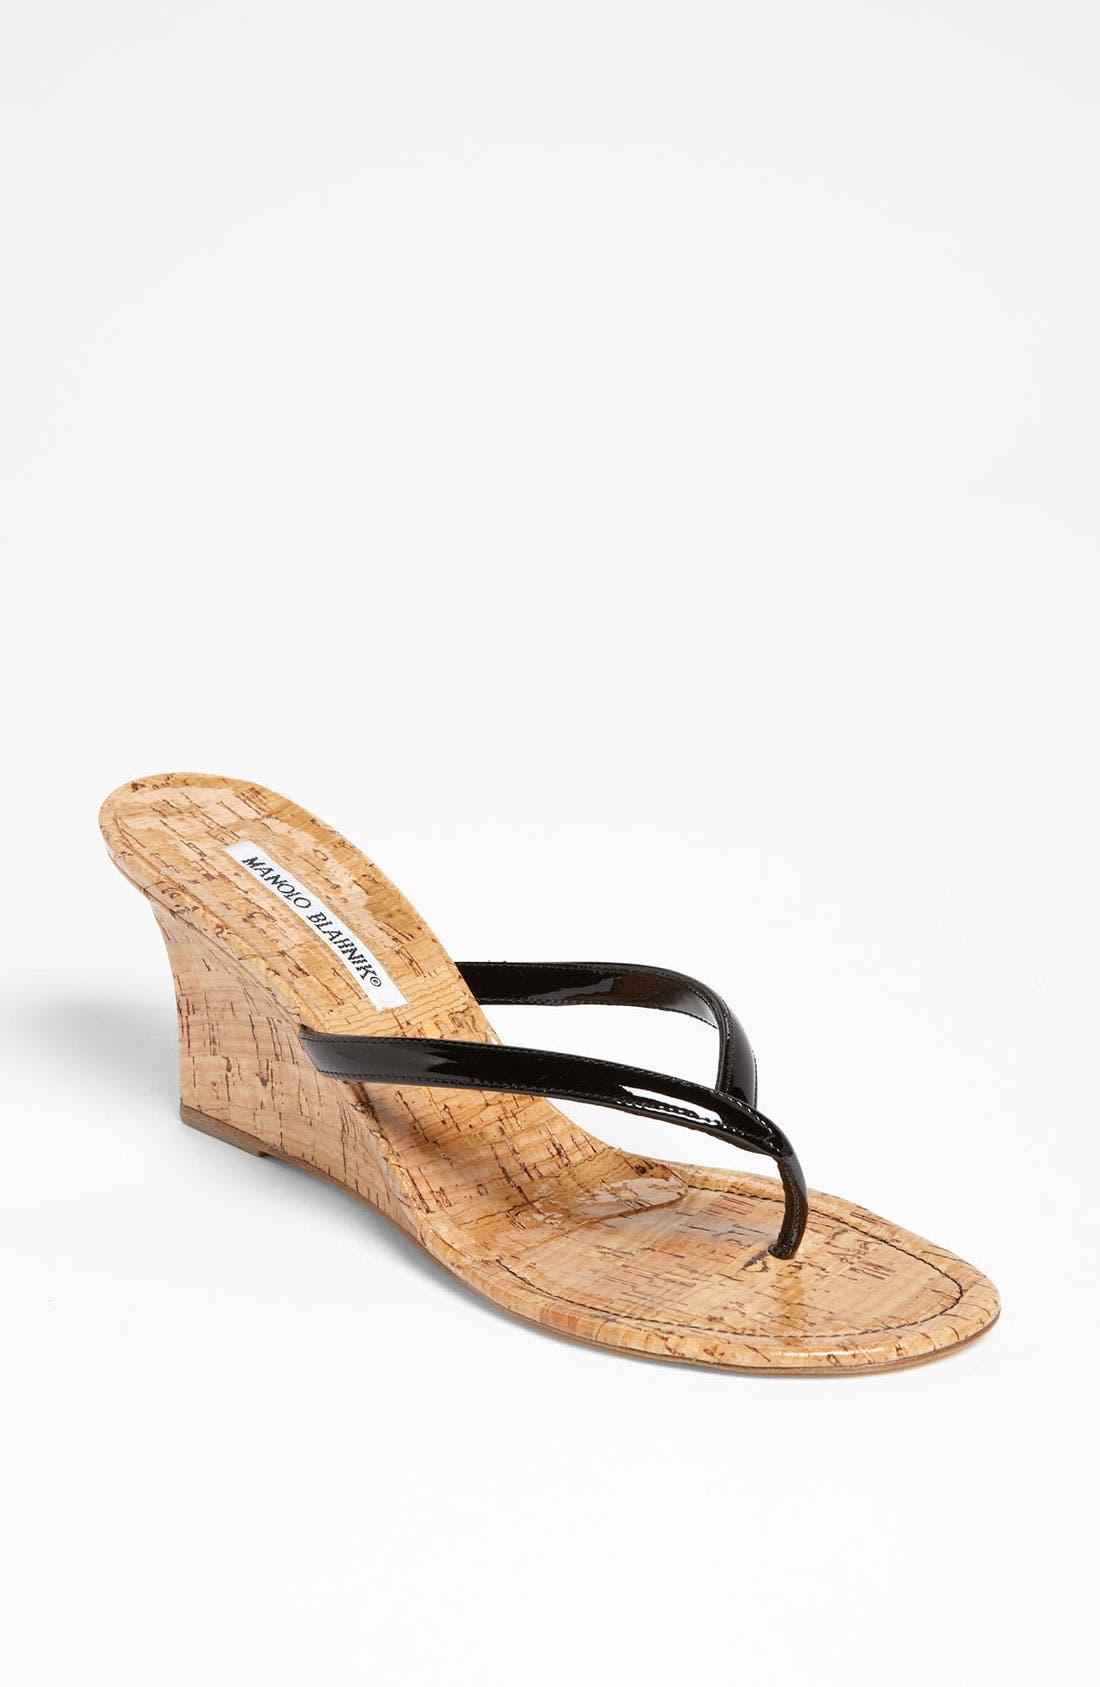 Main Image - Manolo Blahnik 'Patwedge' Sandal